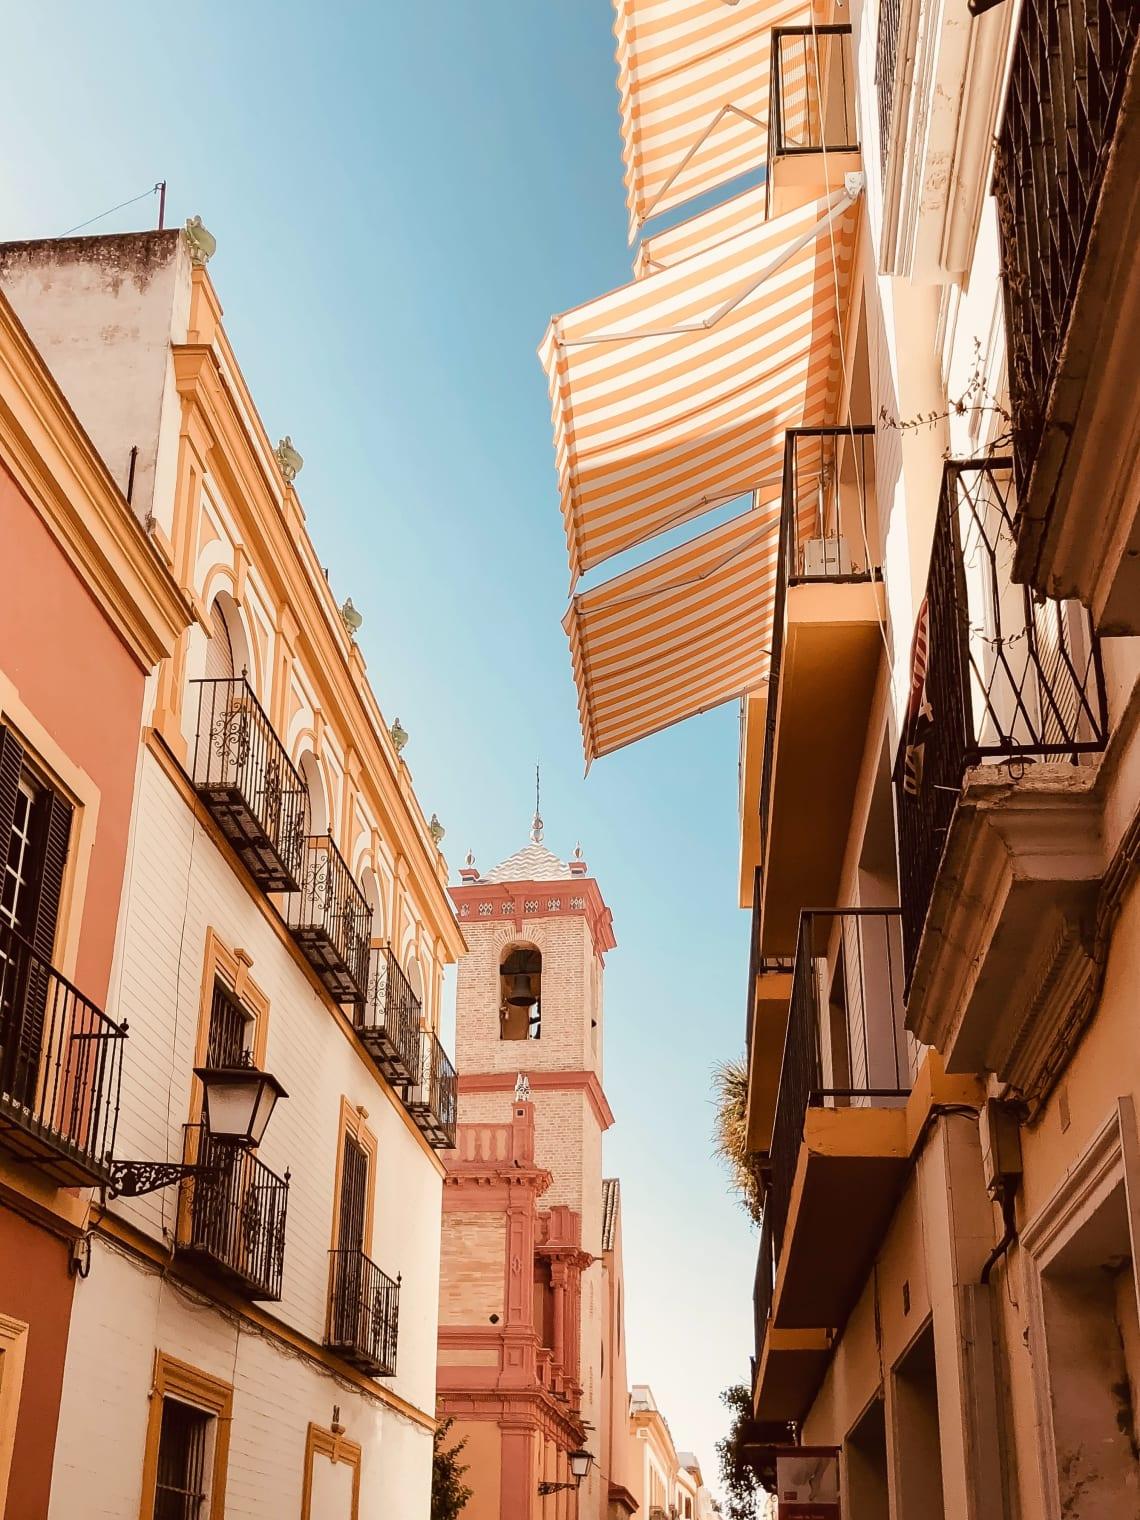 Streets of Seville, Spain